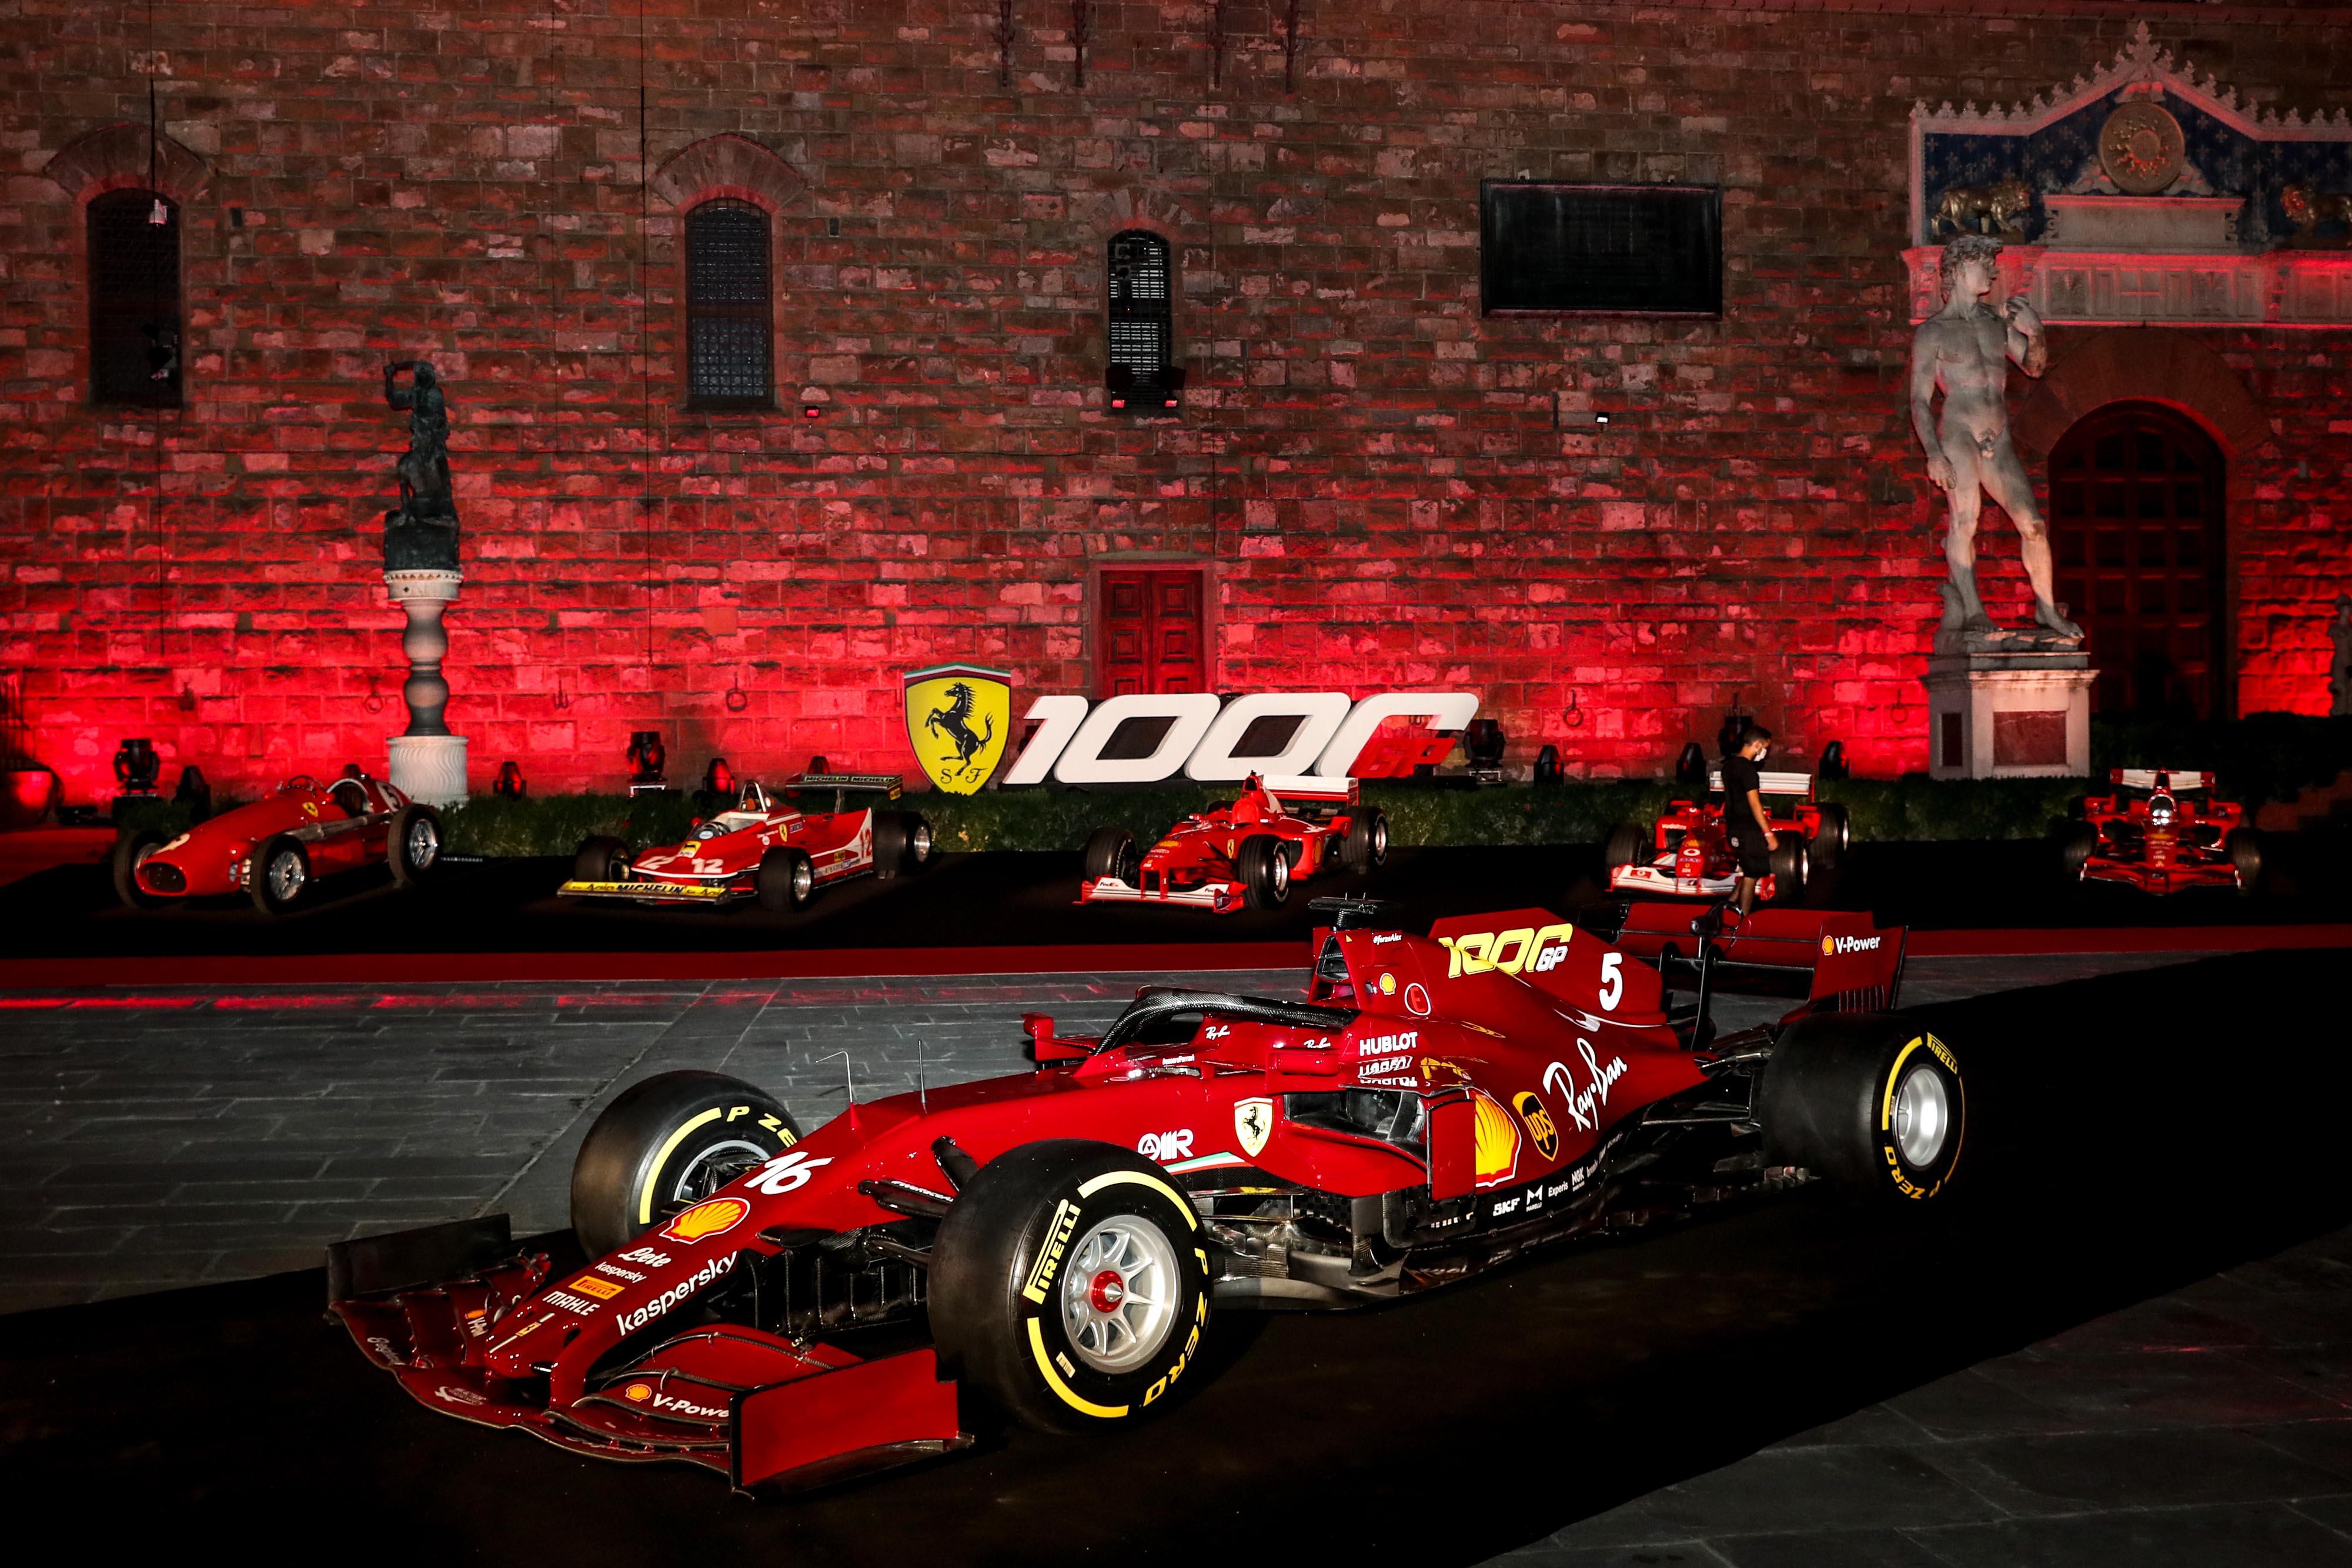 Ferrari Sf1000 4k Wallpaper Formula One Cars Formula 1 Racing Cars 2020 Cars 2690